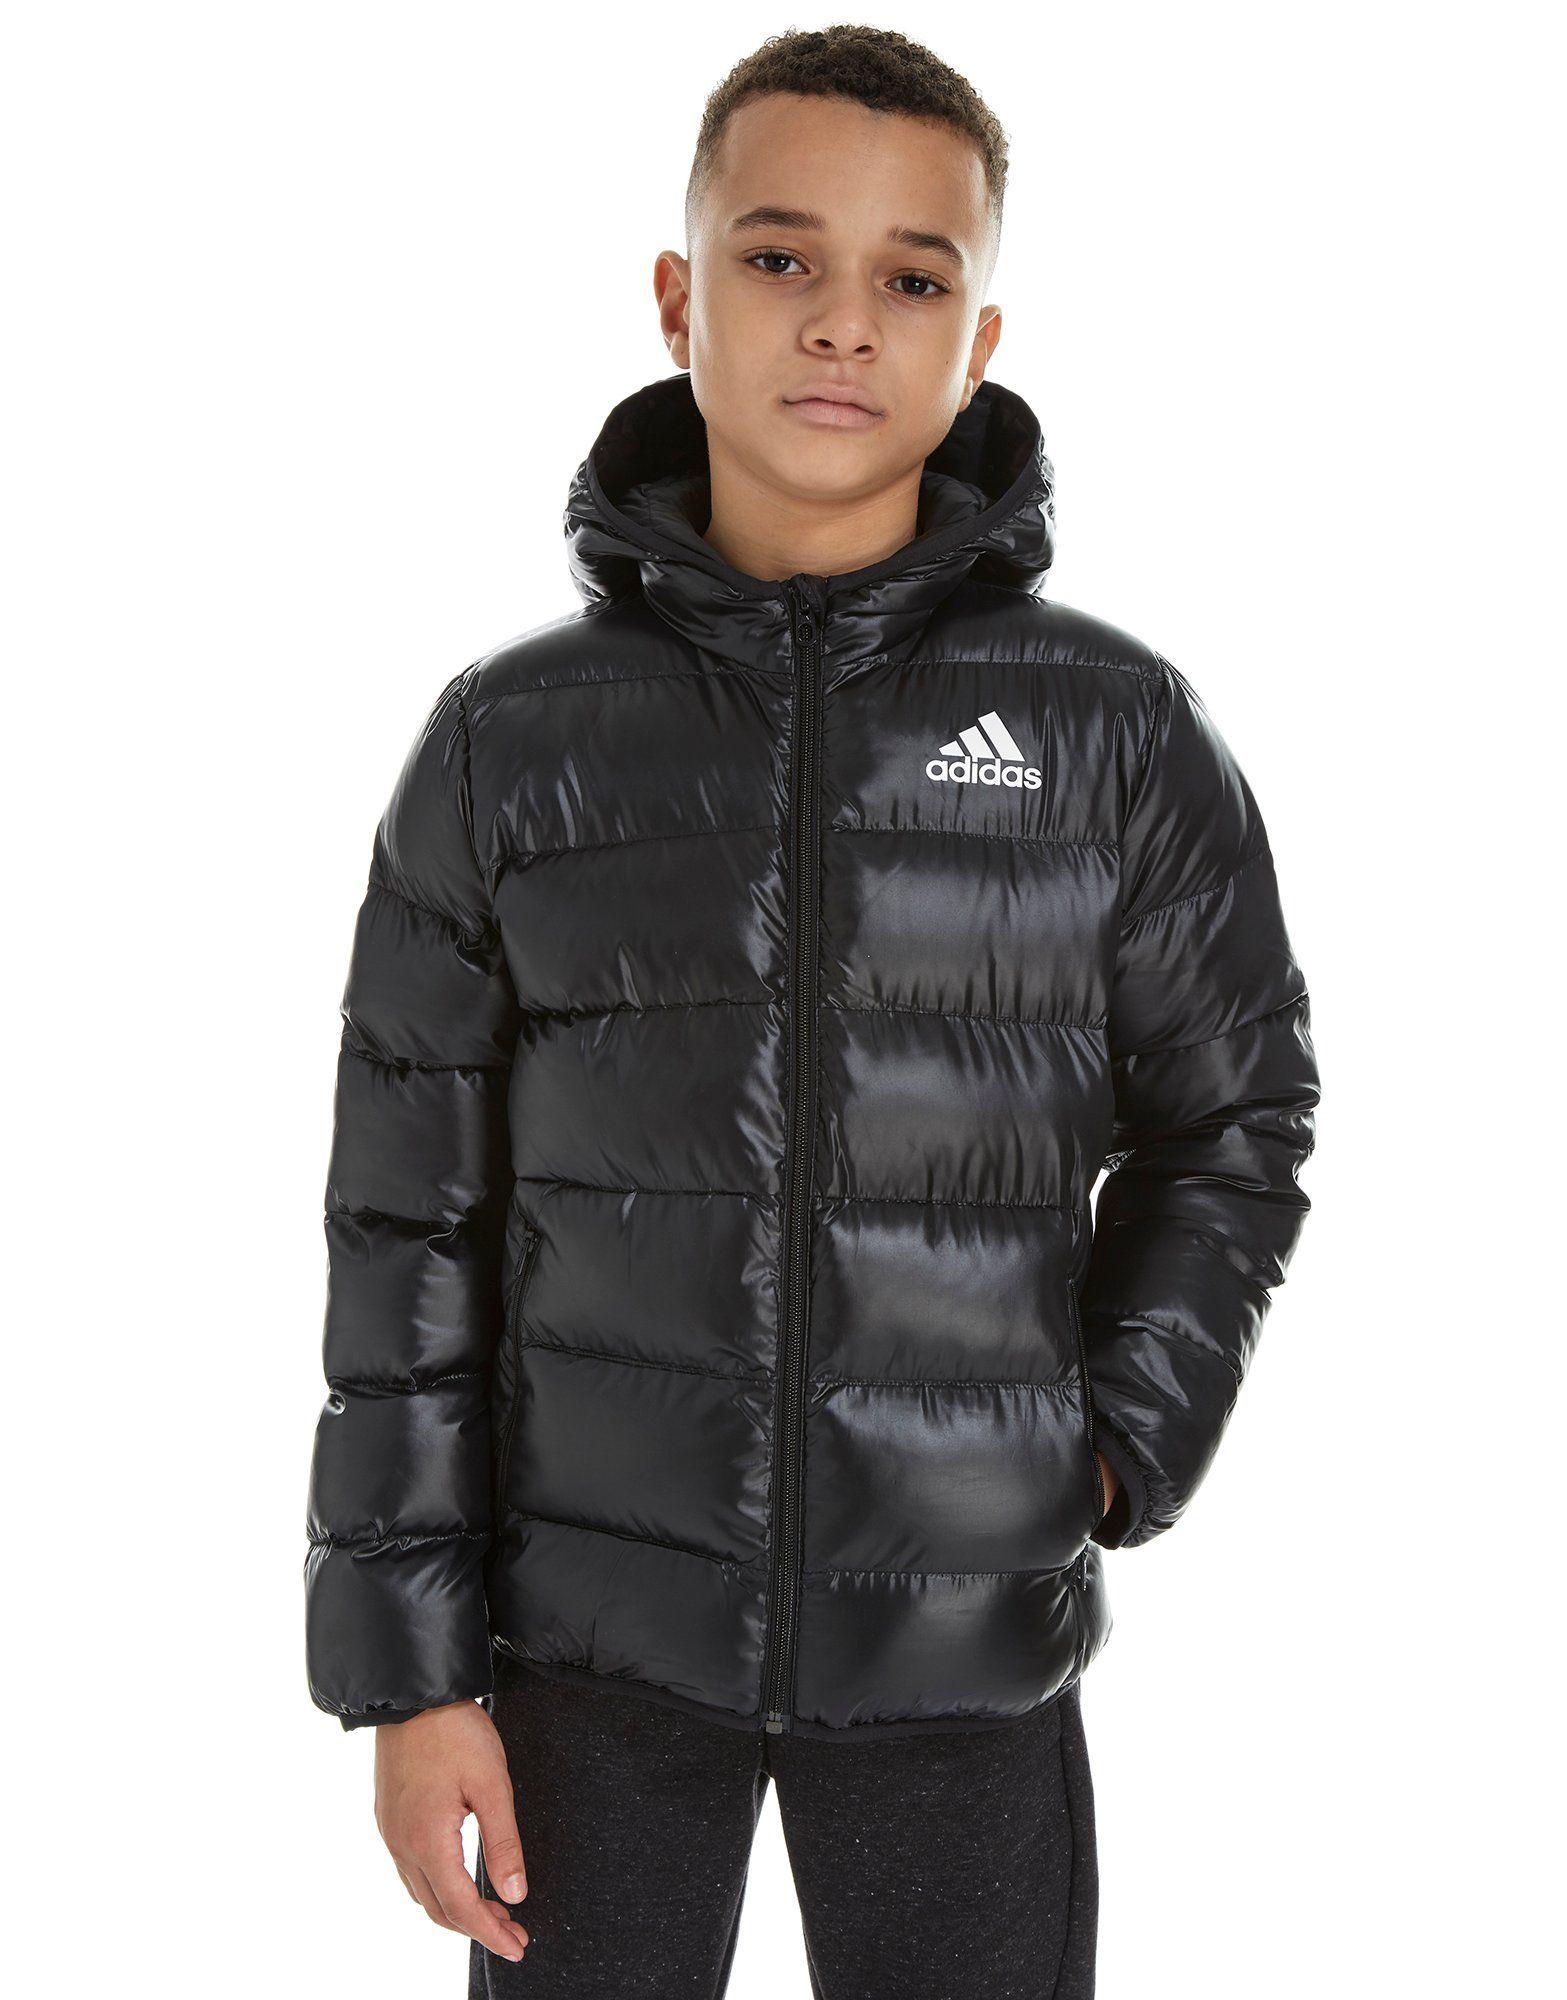 adidas Hooded Bomber Jacket Junior | Adidas | Hooded bomber